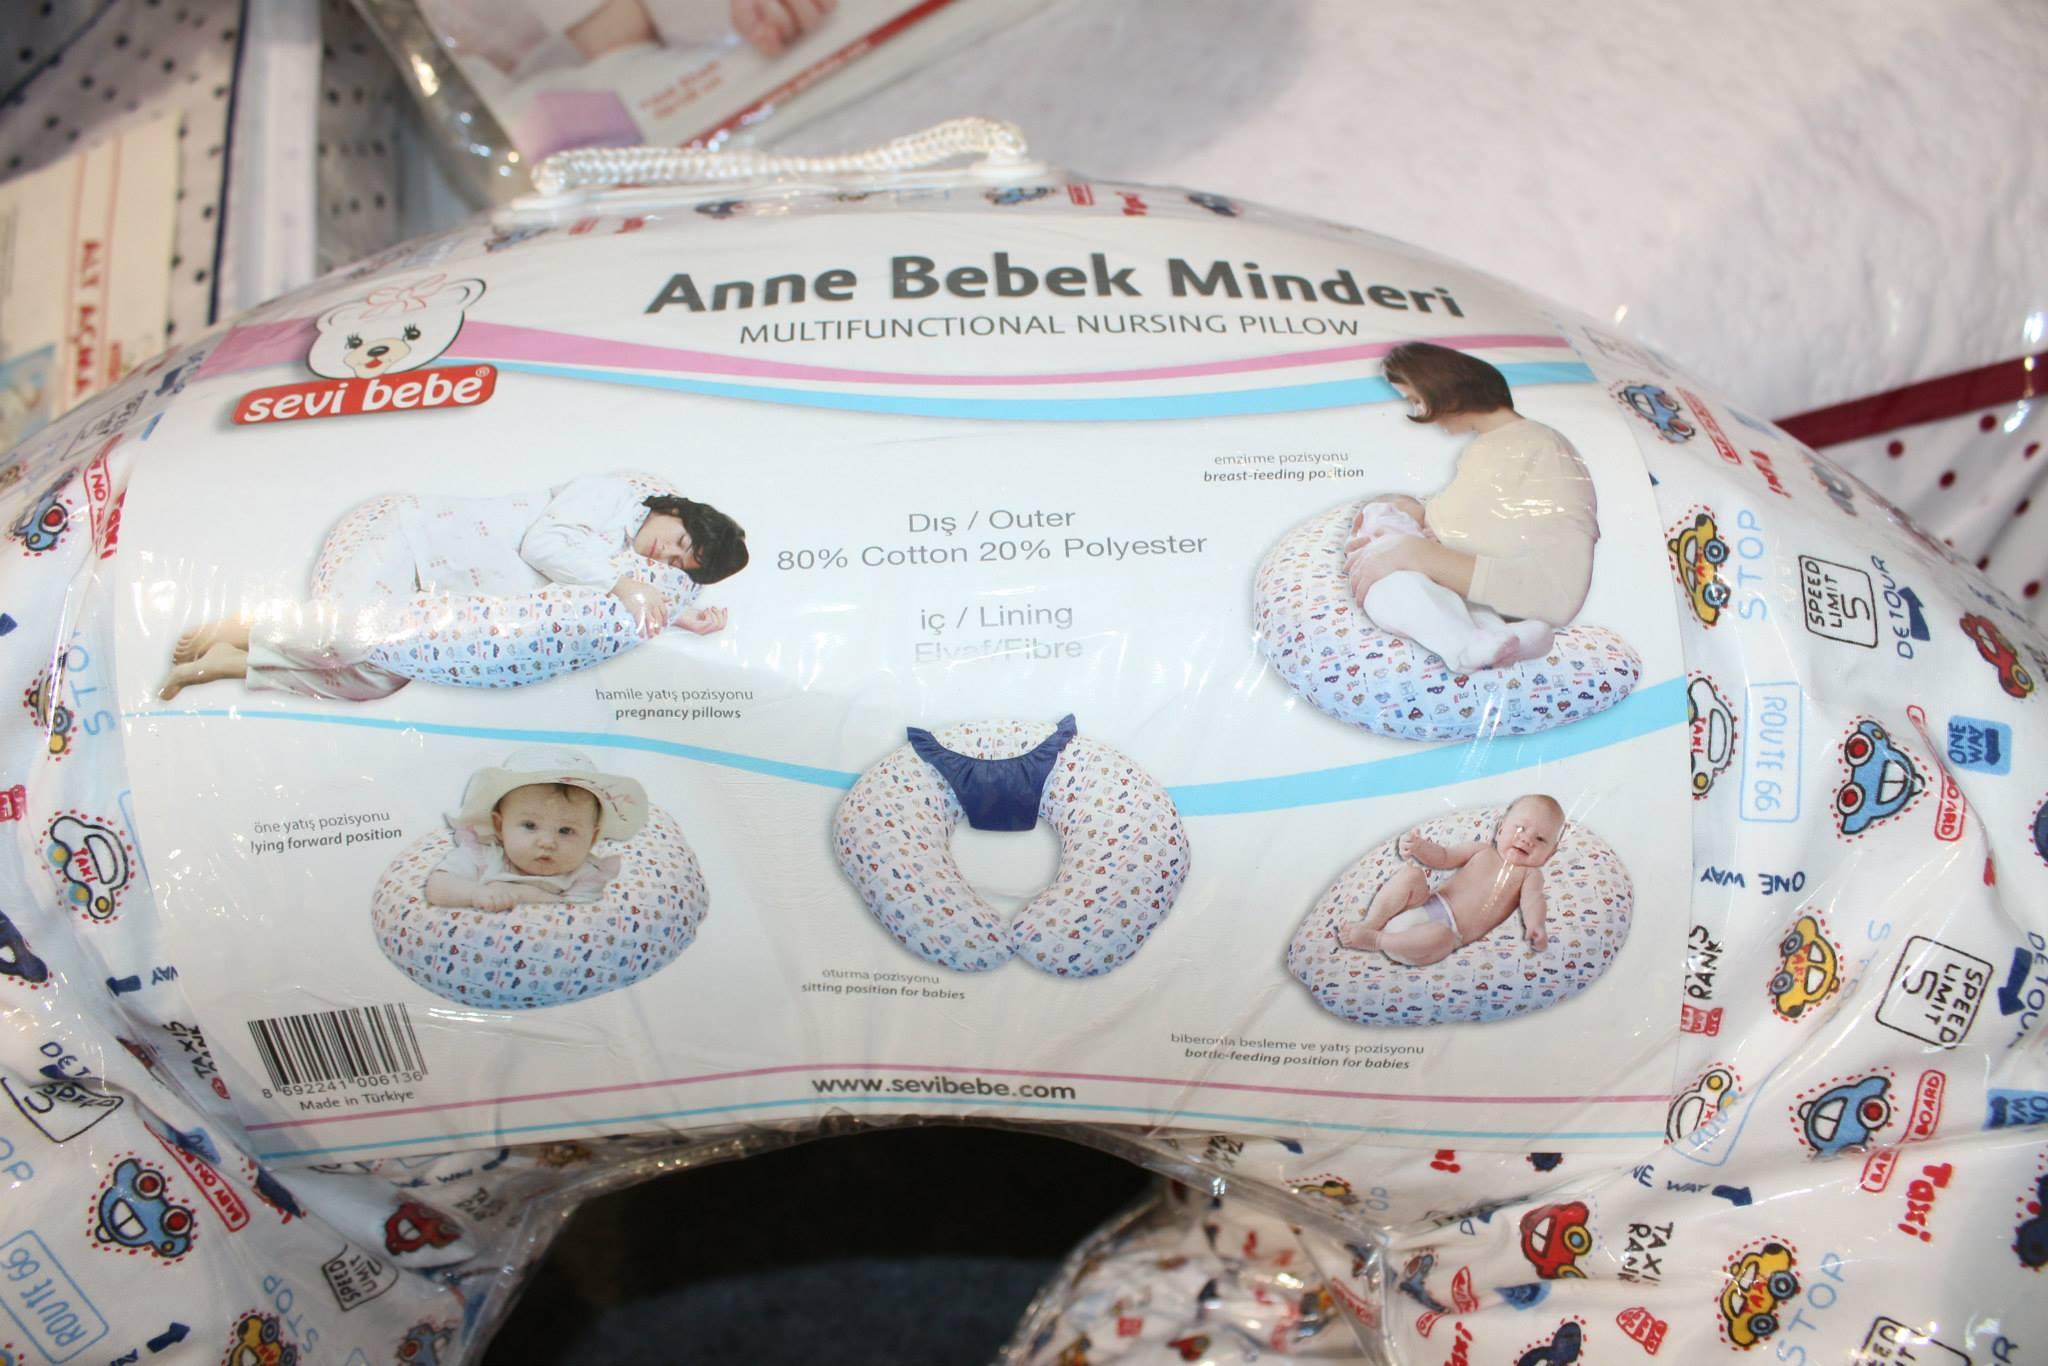 Anne bebek minderi1